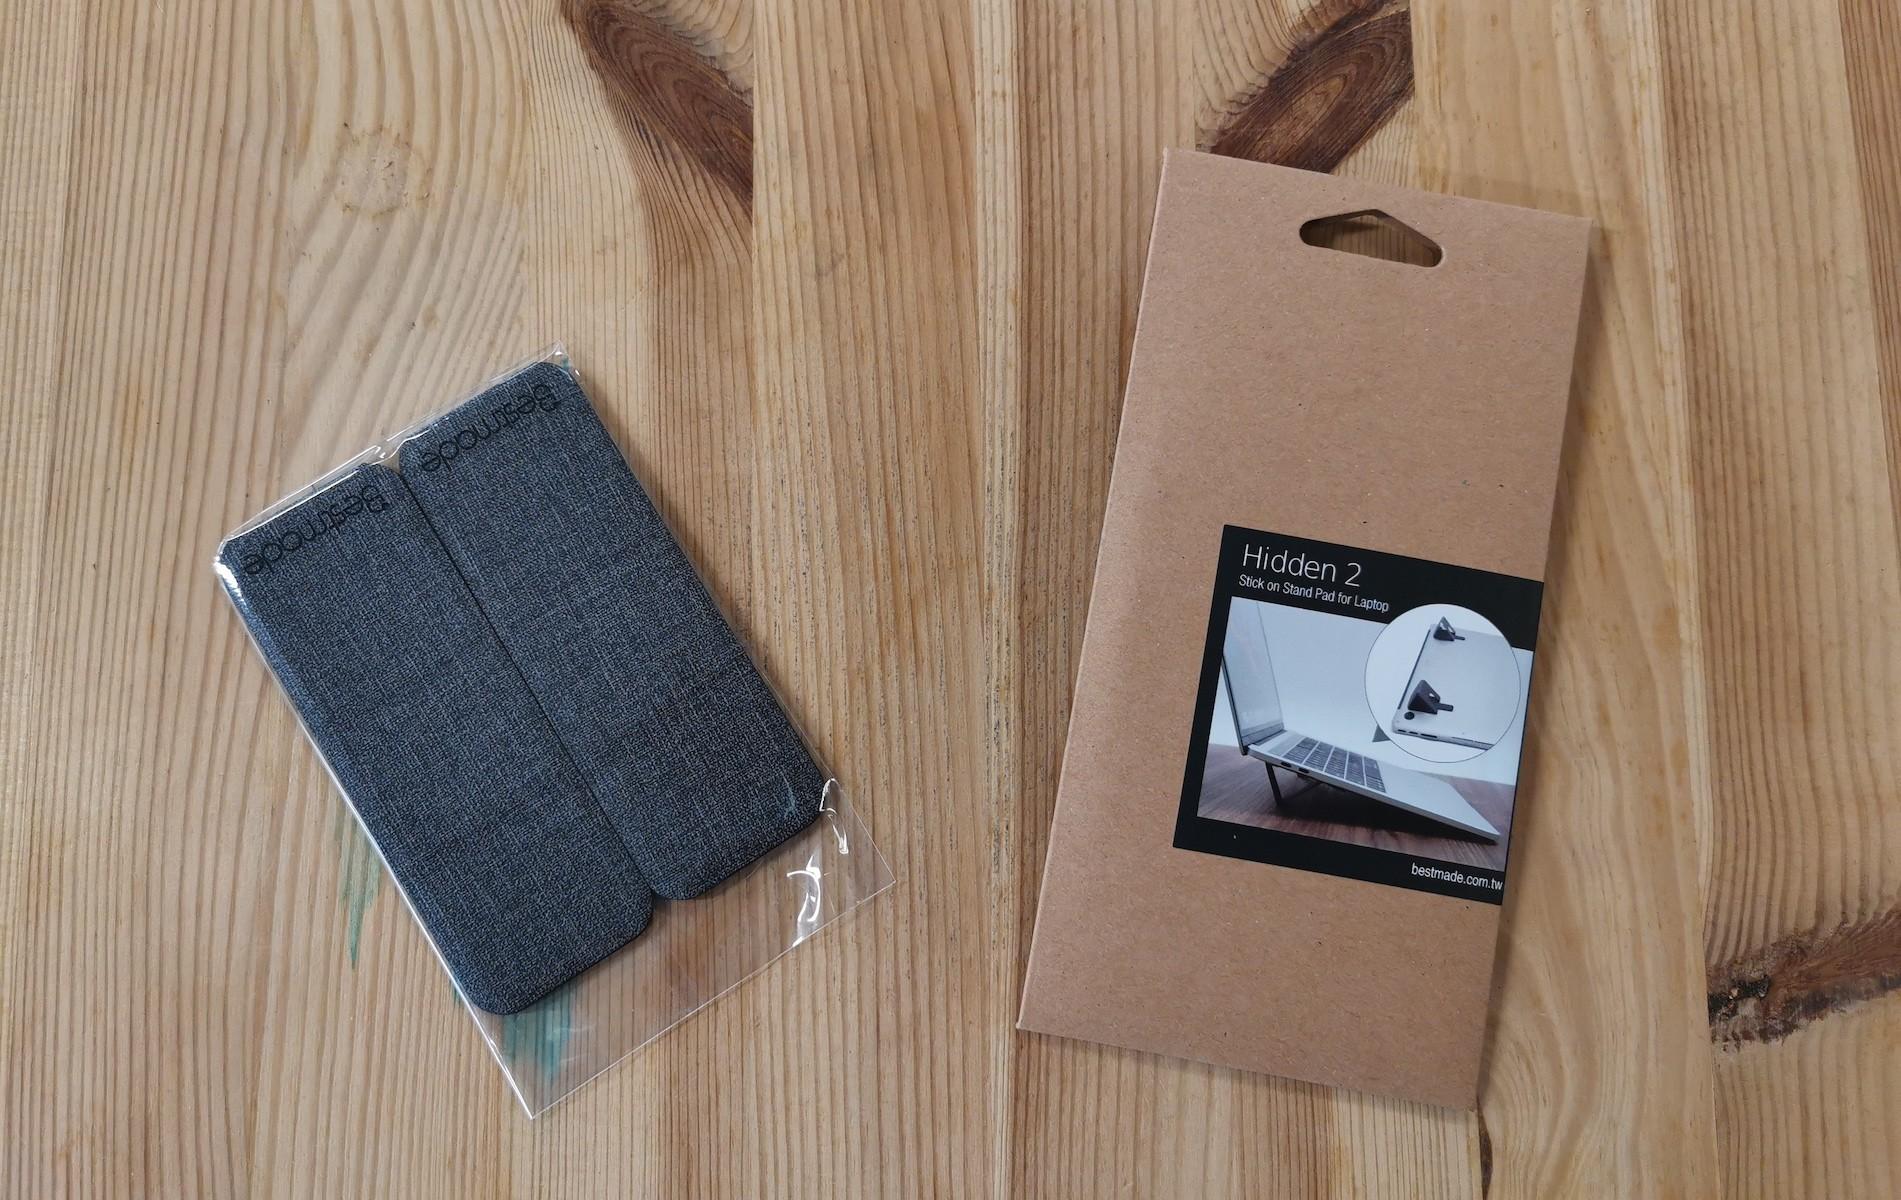 Product, Product design, Font, Design, , Wood, Hardwood, Electronic device, Plywood